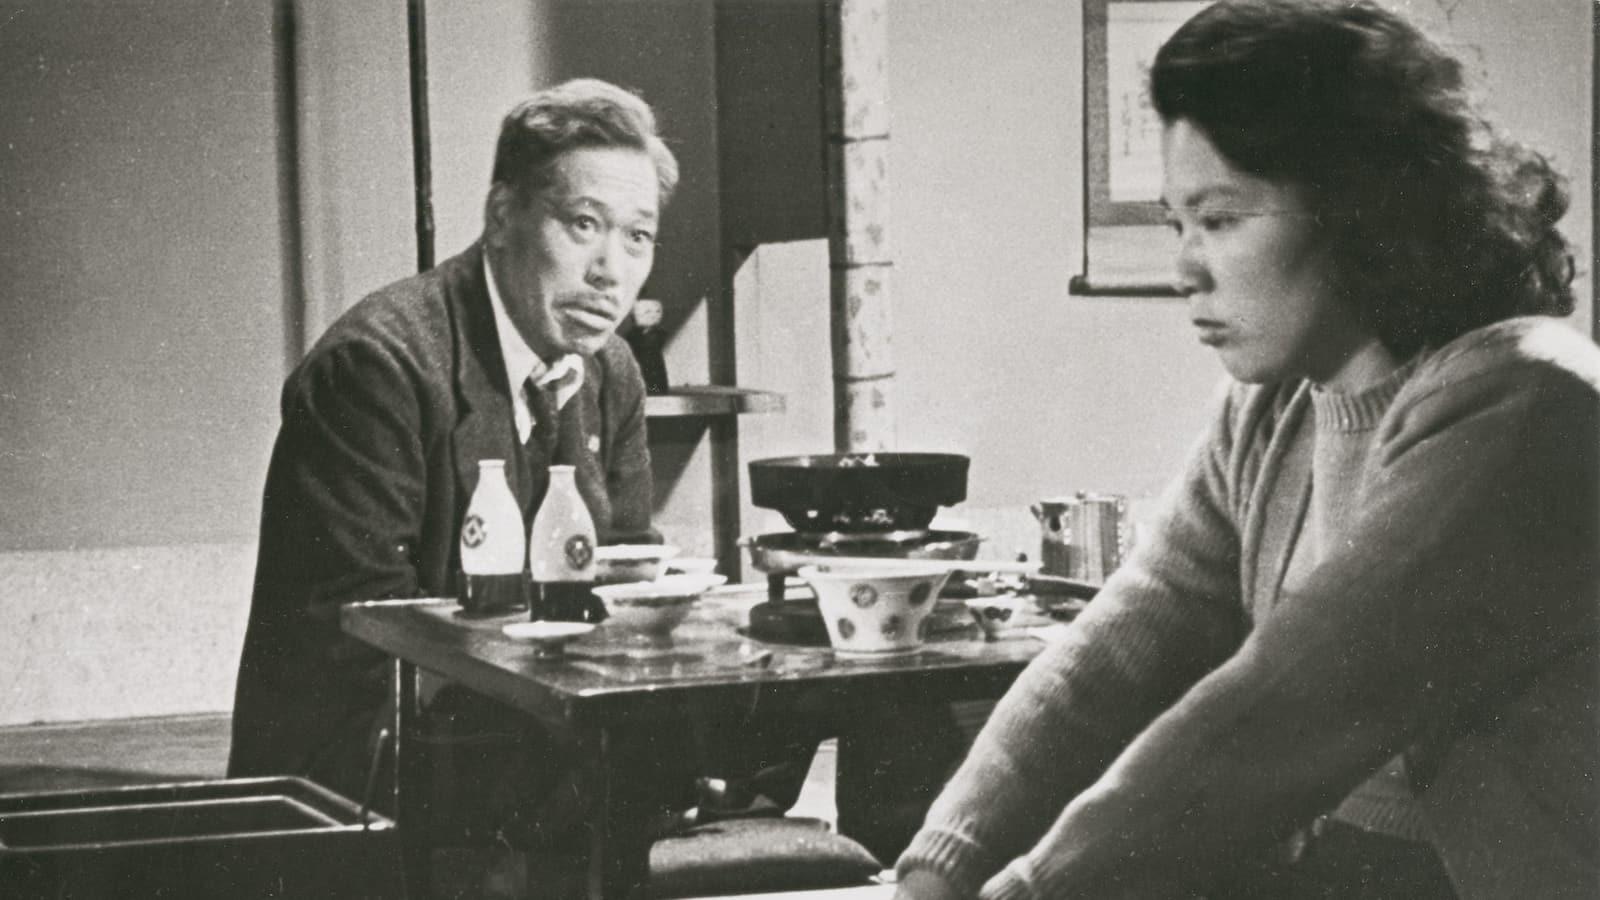 ikiru-att-leva-1952